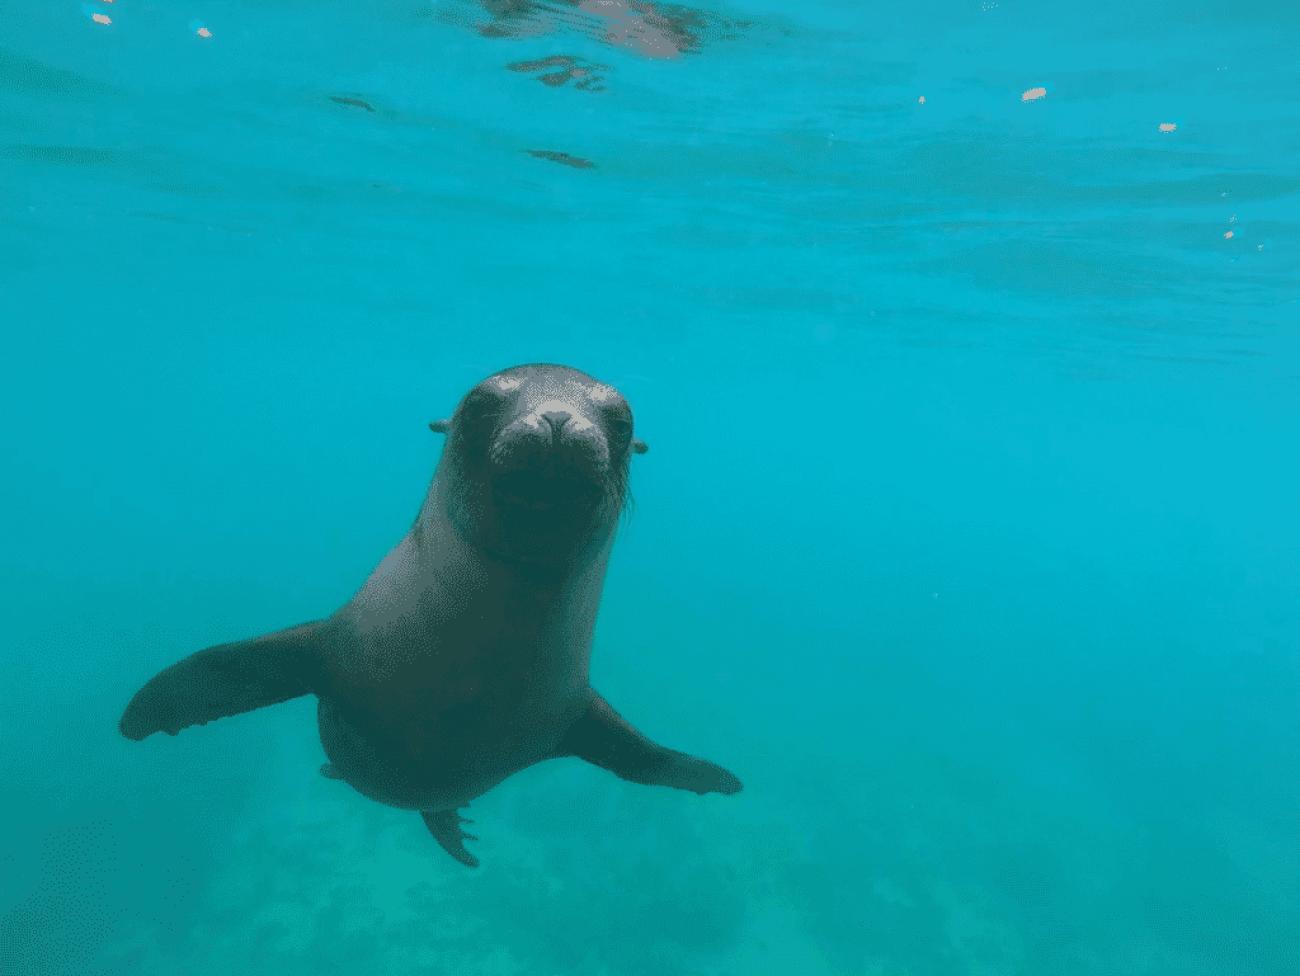 Galápagos sea lion #thatonetimewhen